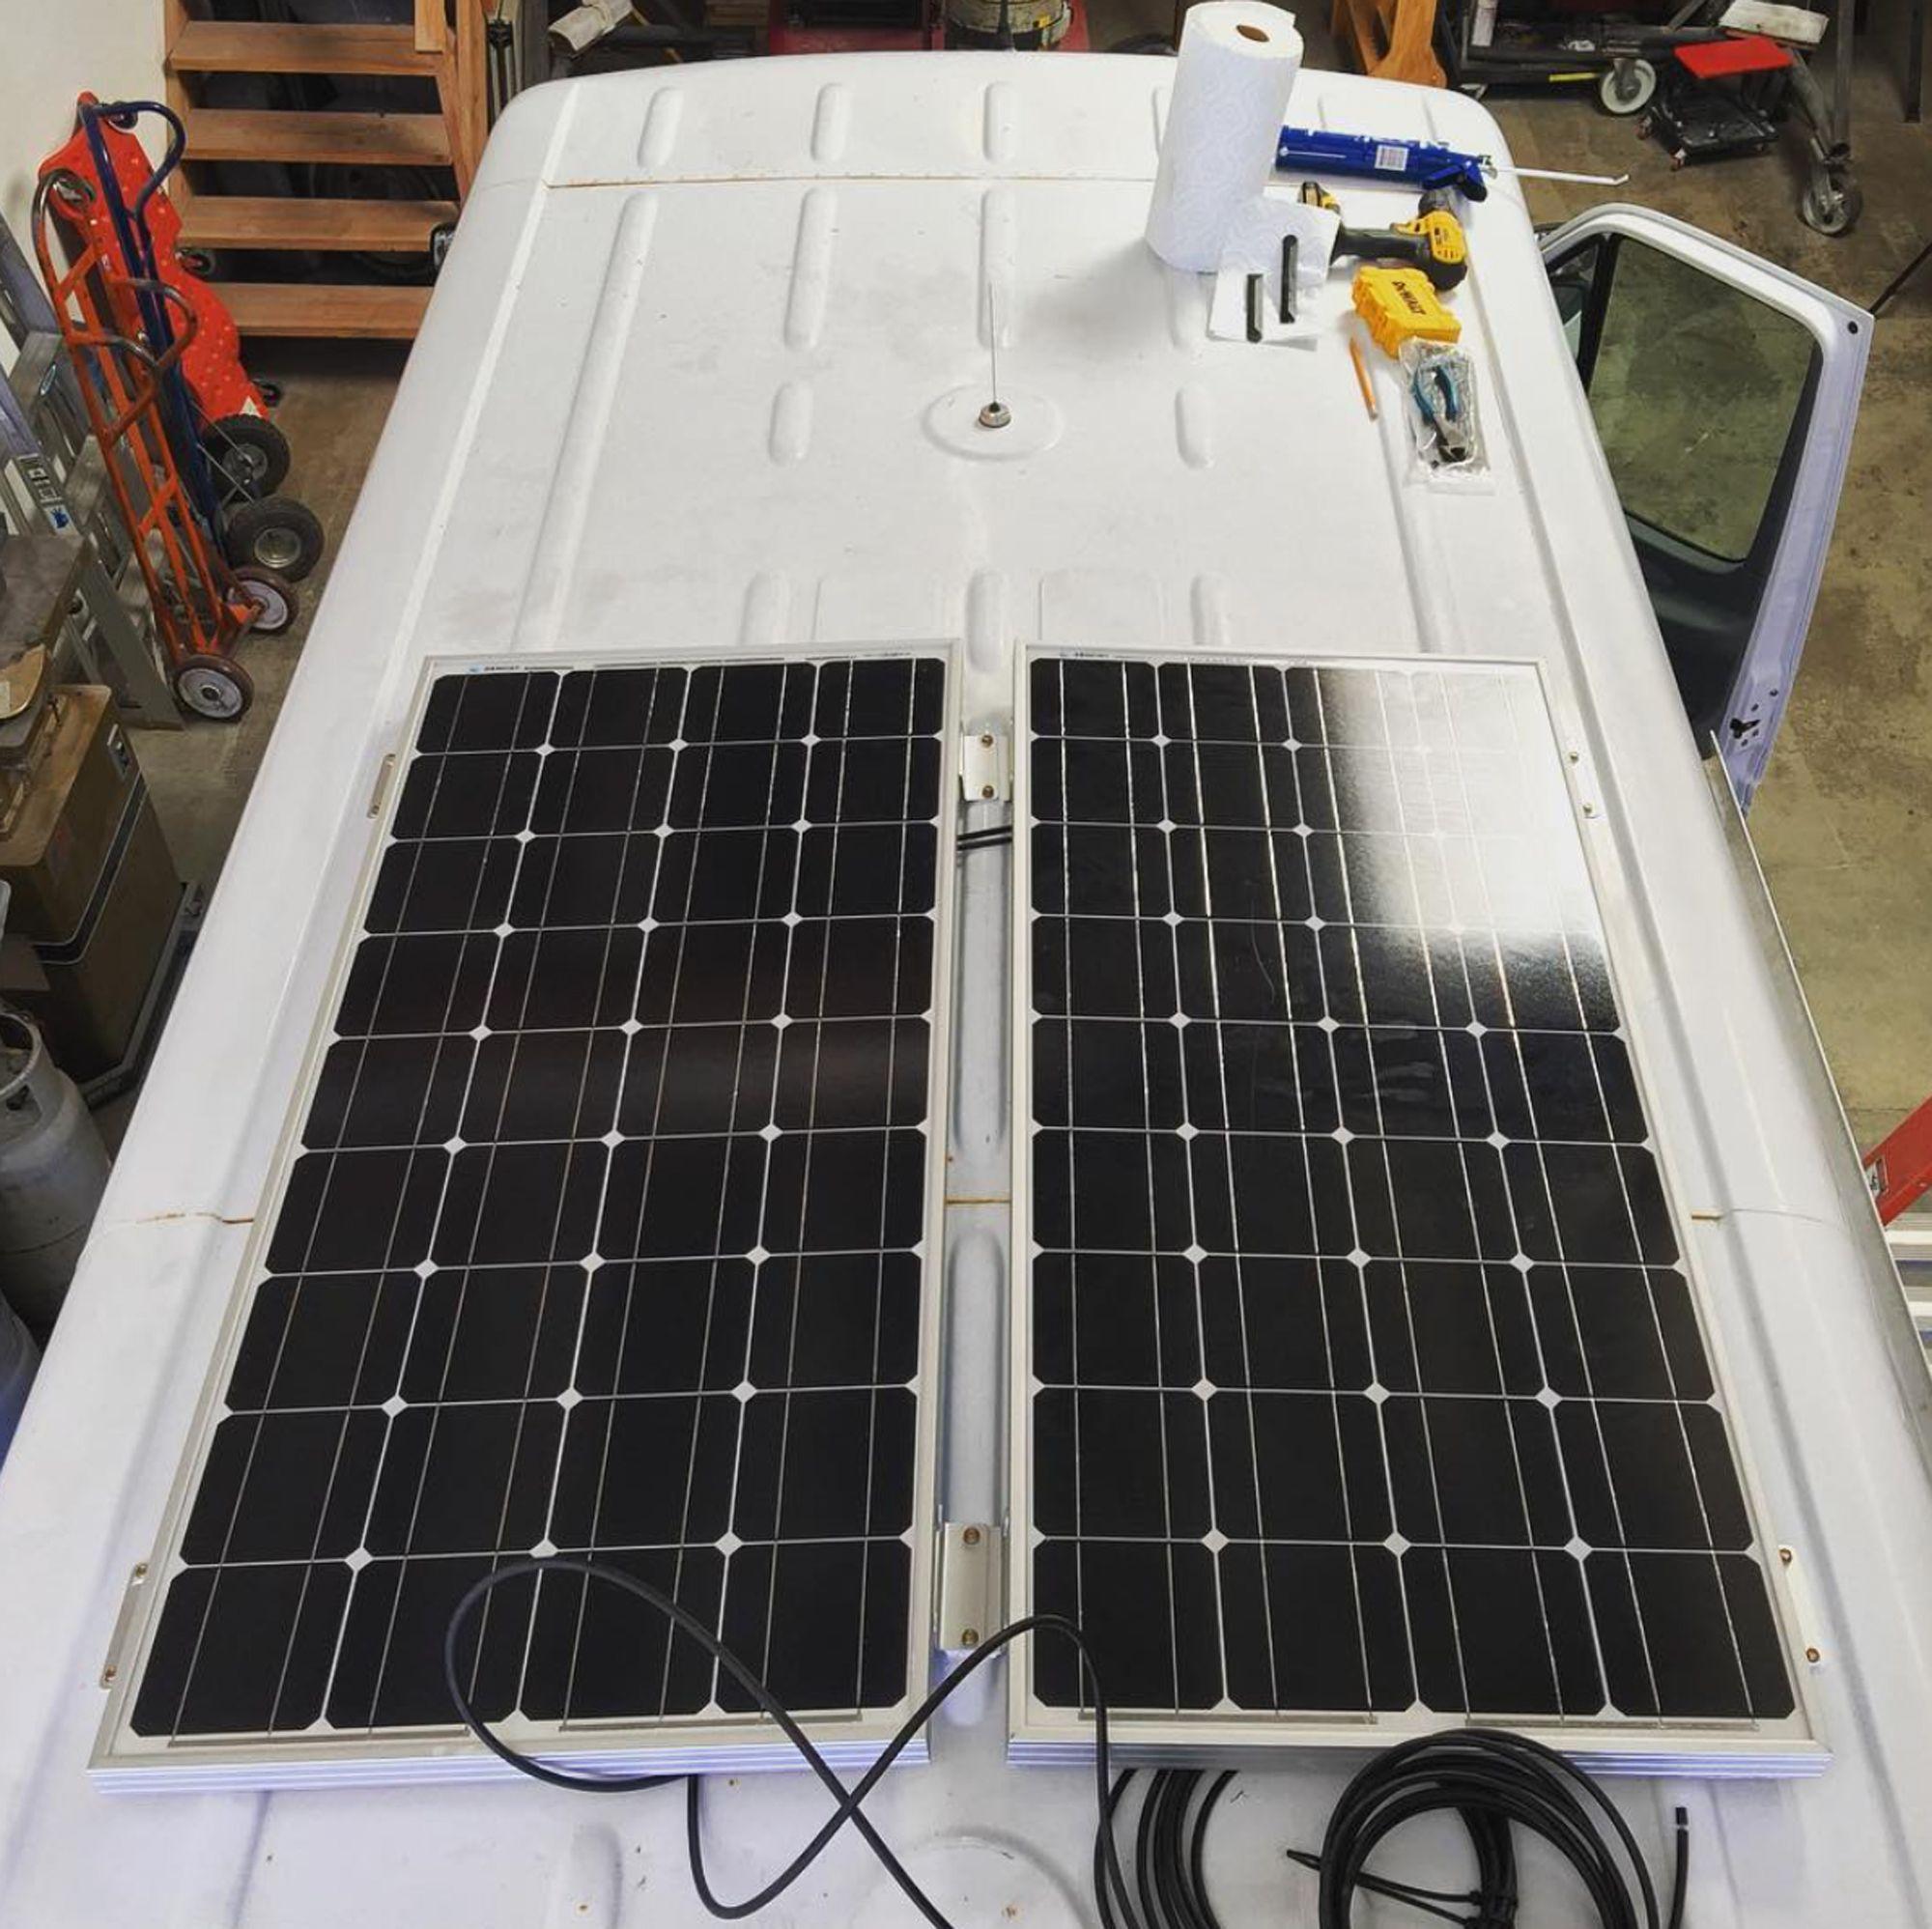 Solar Panels VanLife VanConversion